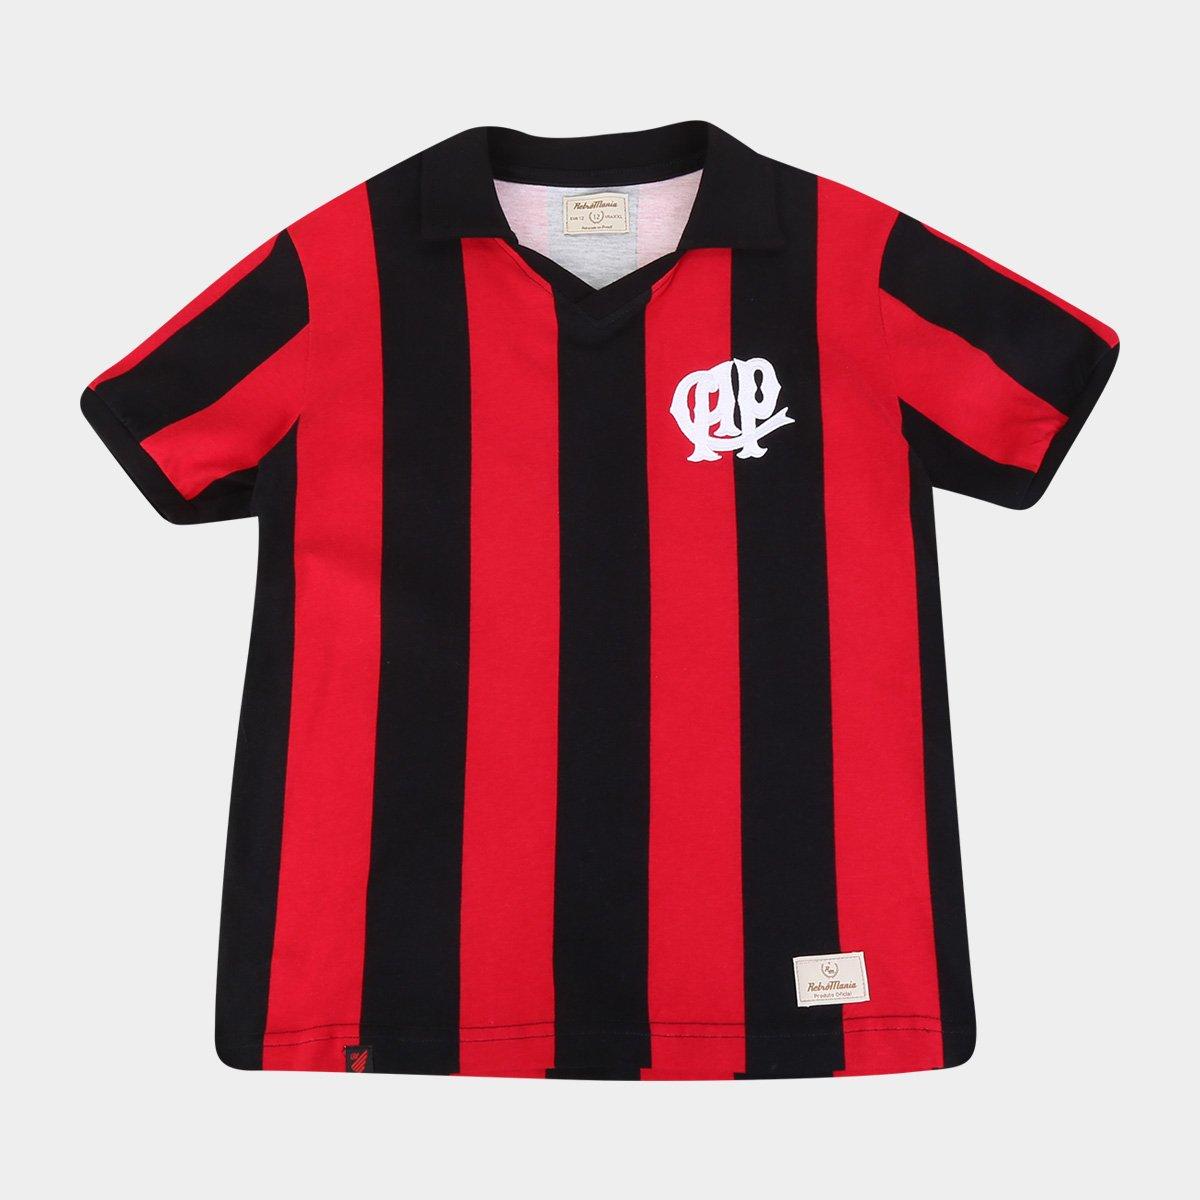 Camiseta Athletico Paranaense Juvenil Retrô 1990